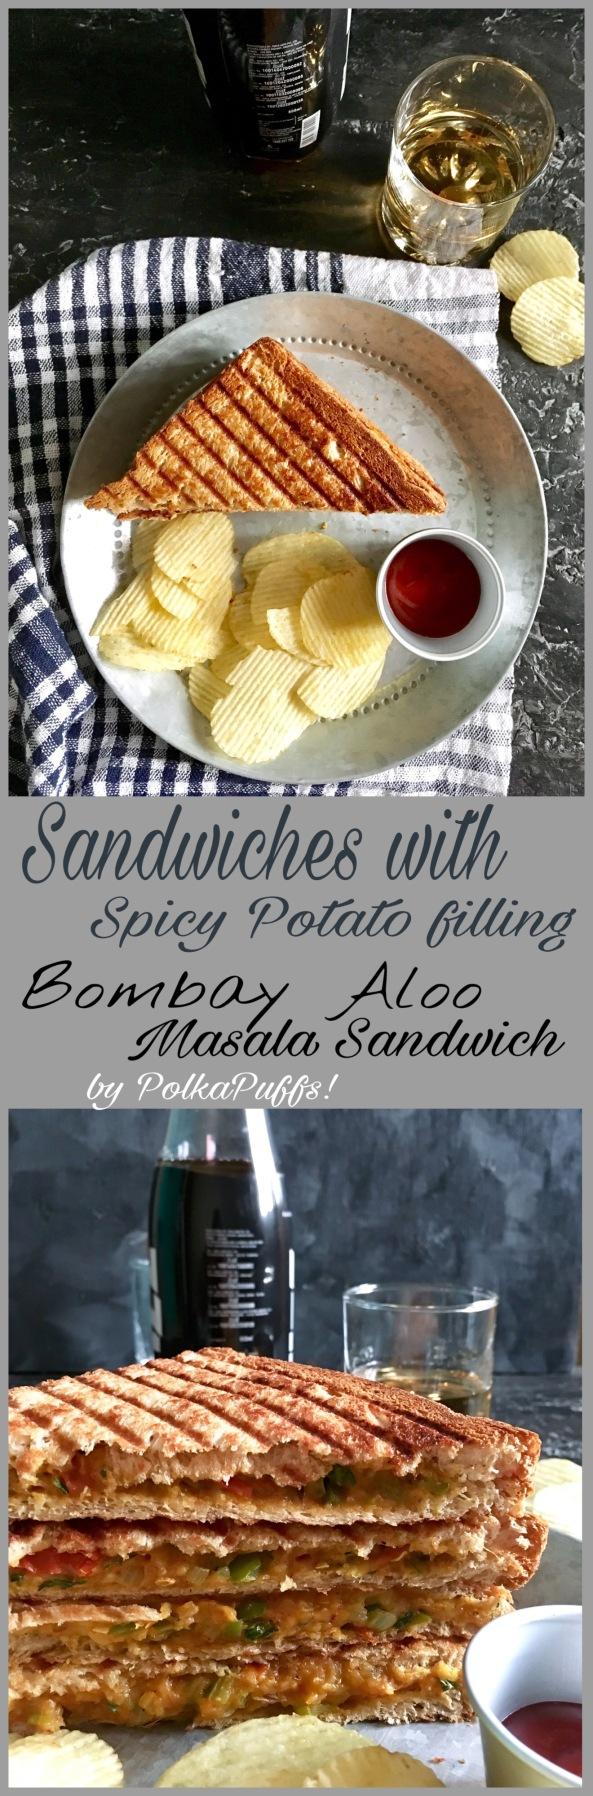 Sandwiches with Spicy Potato fillng | Bombay Masala Aloo Sandwich | PolkaPuffs